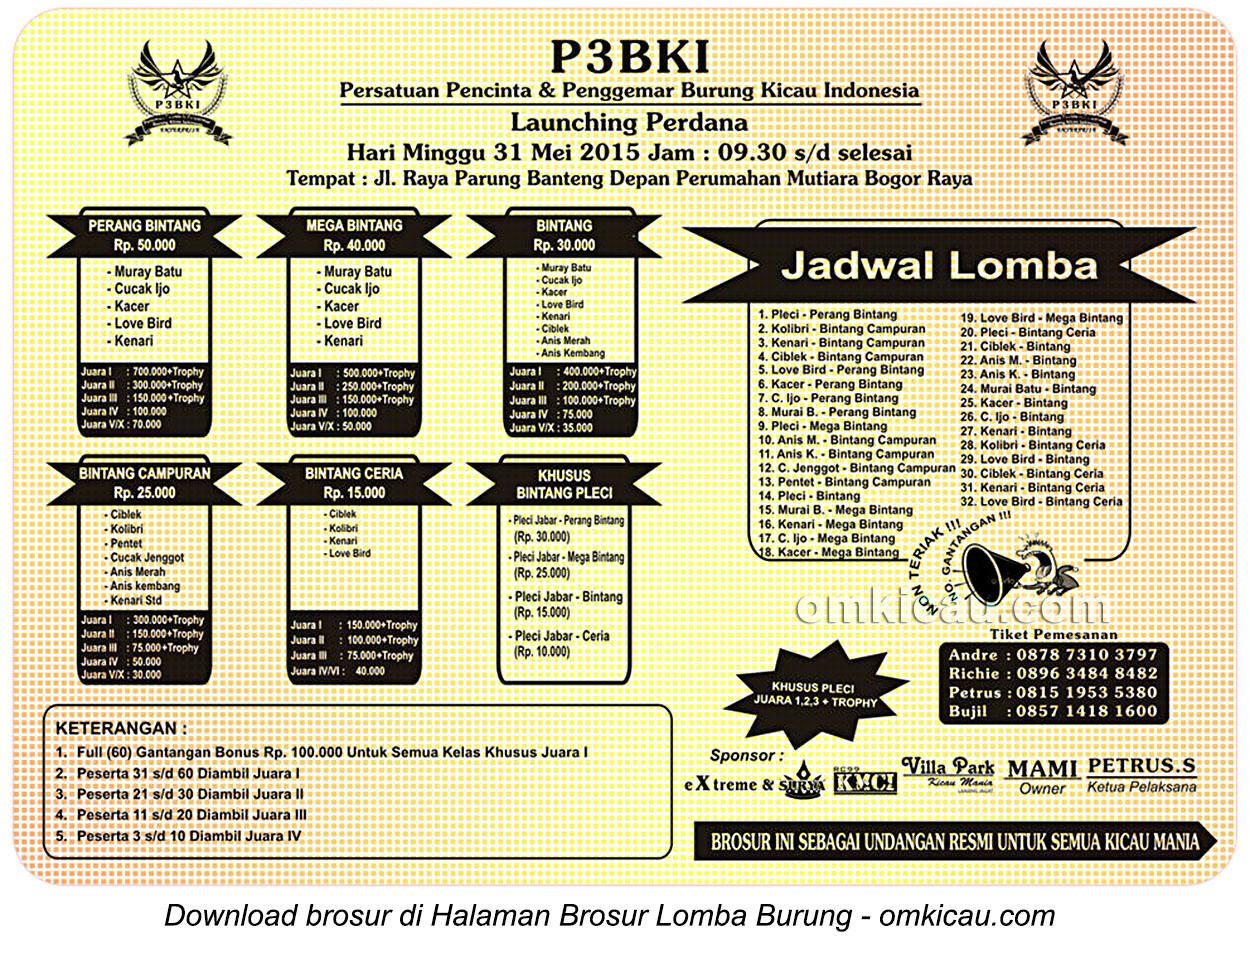 Brosur Lomba Burung Berkicau Launching Perdana P3BKI, Bogor, 31 Mei 2015